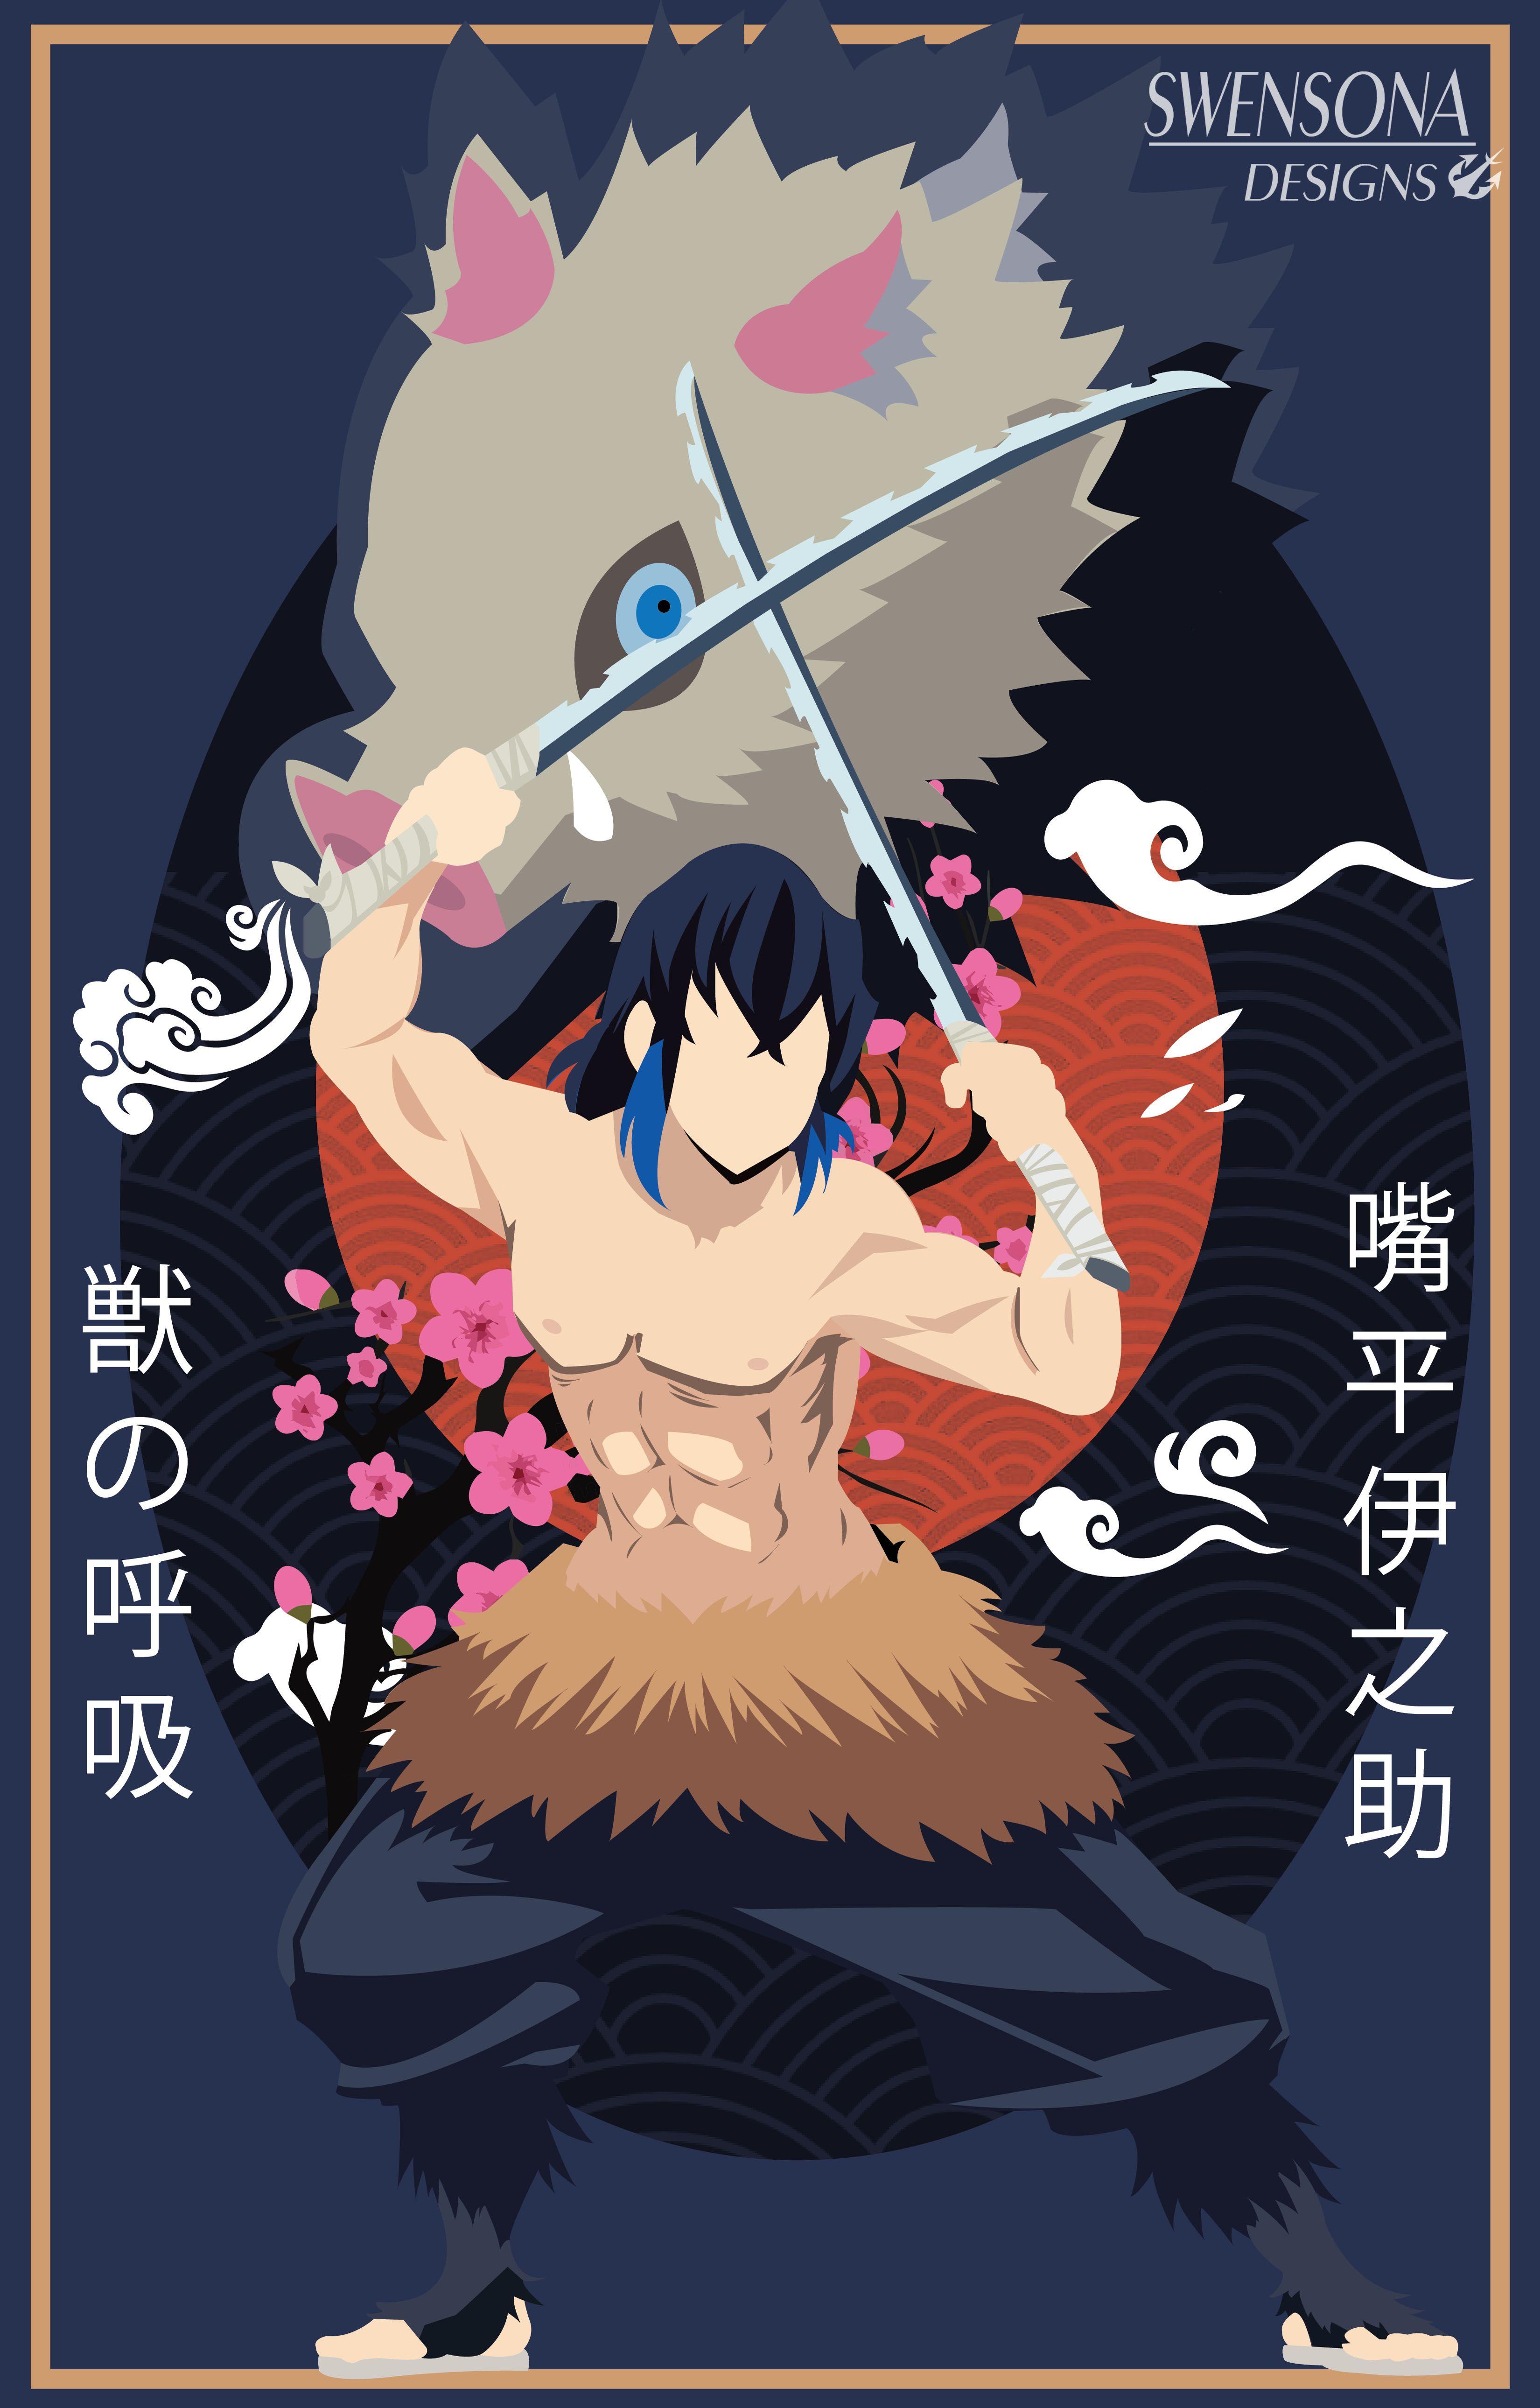 Park Art My WordPress Blog_Anime Minimalist Poster Demon Slayer